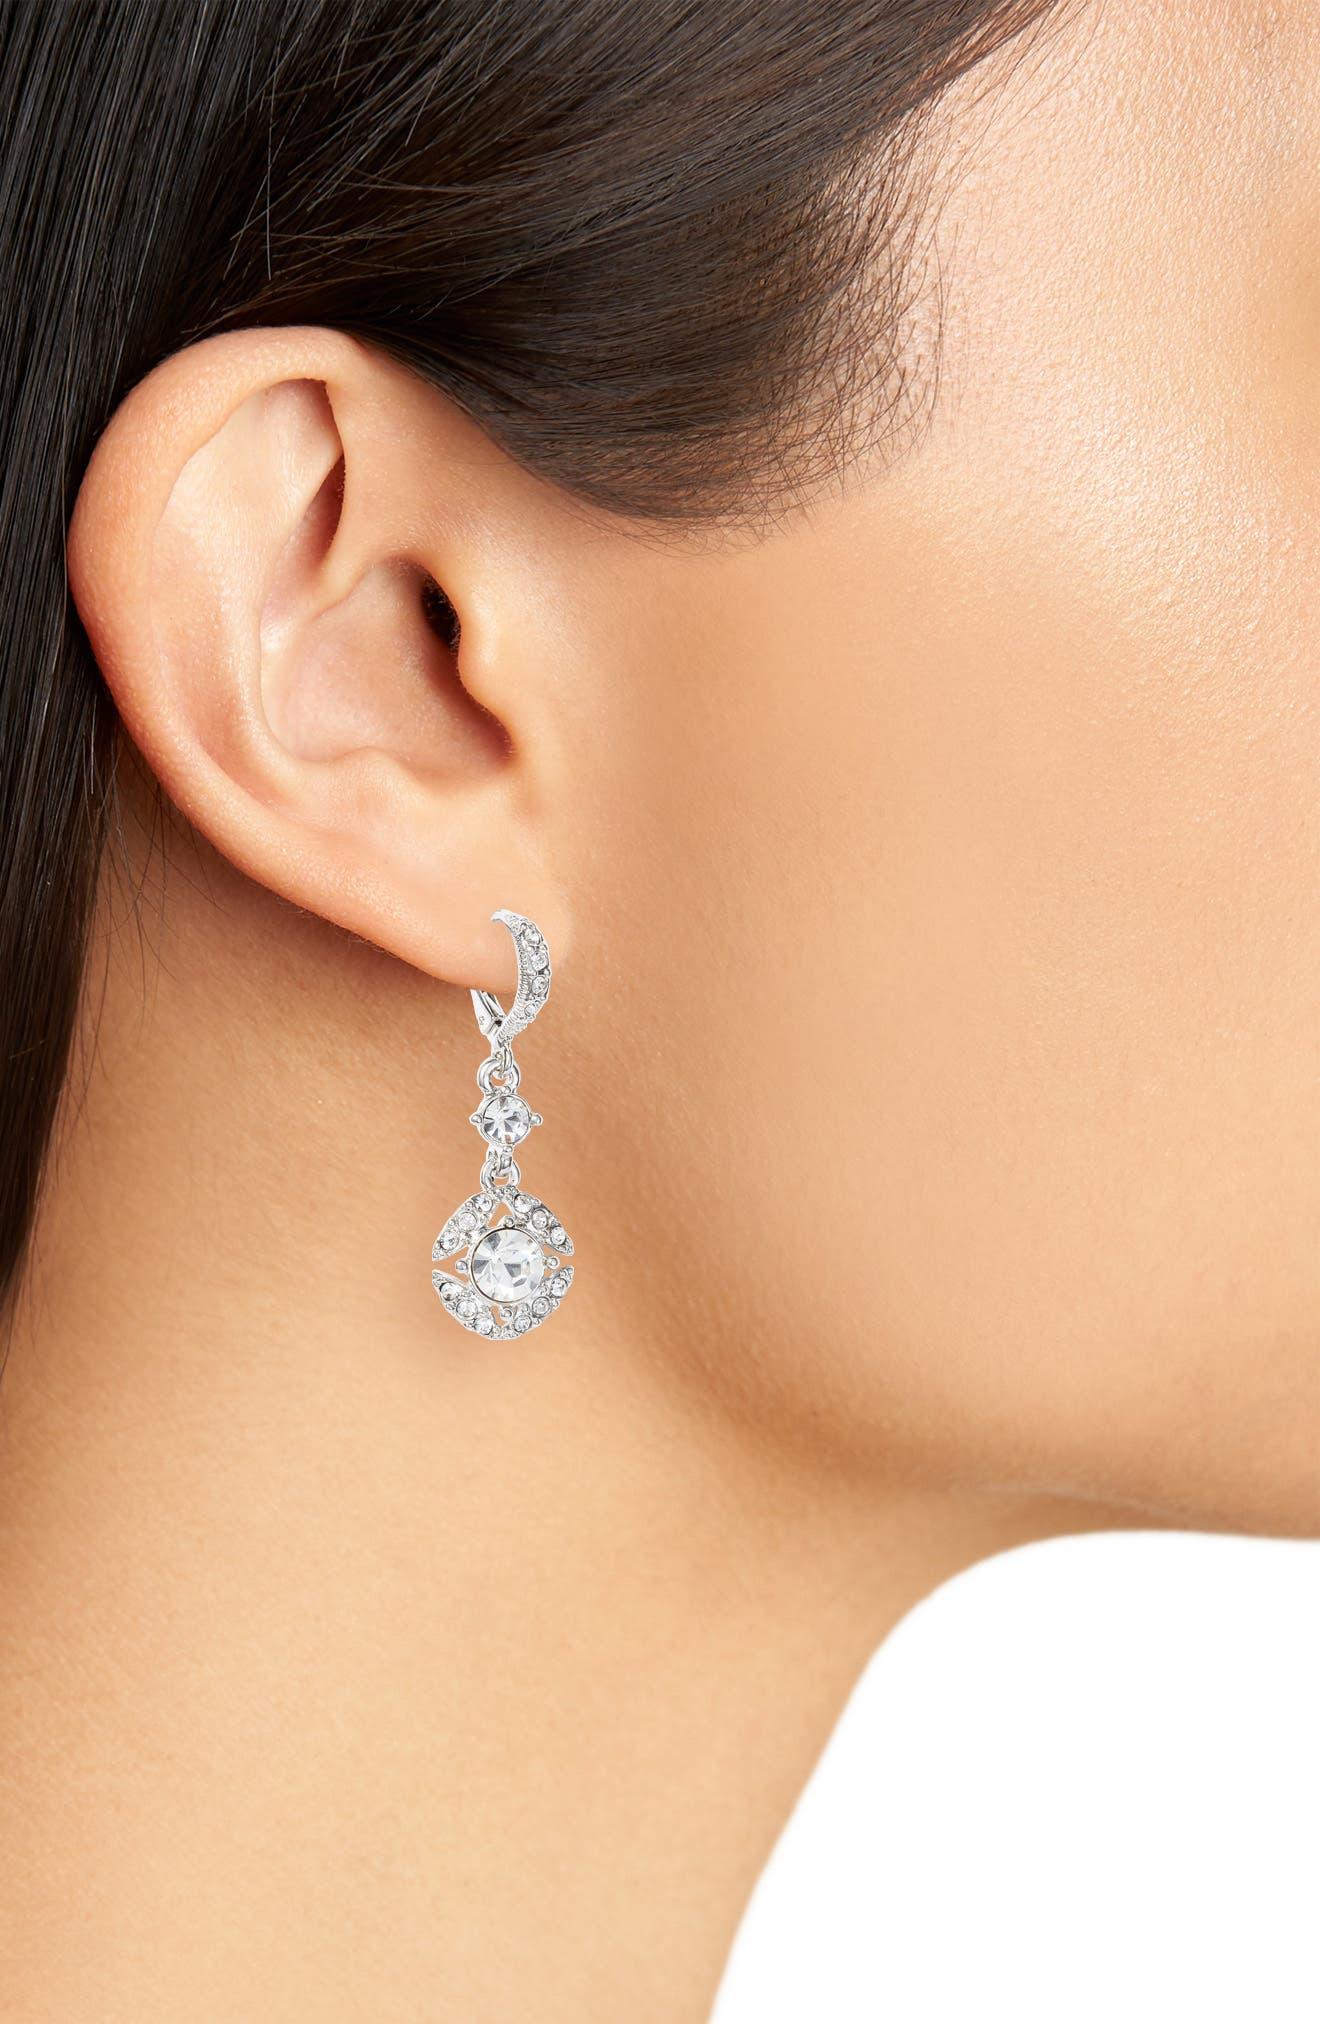 Crystal Drop Earrings,                             Alternate thumbnail 2, color,                             SILVER/ CRYSTAL